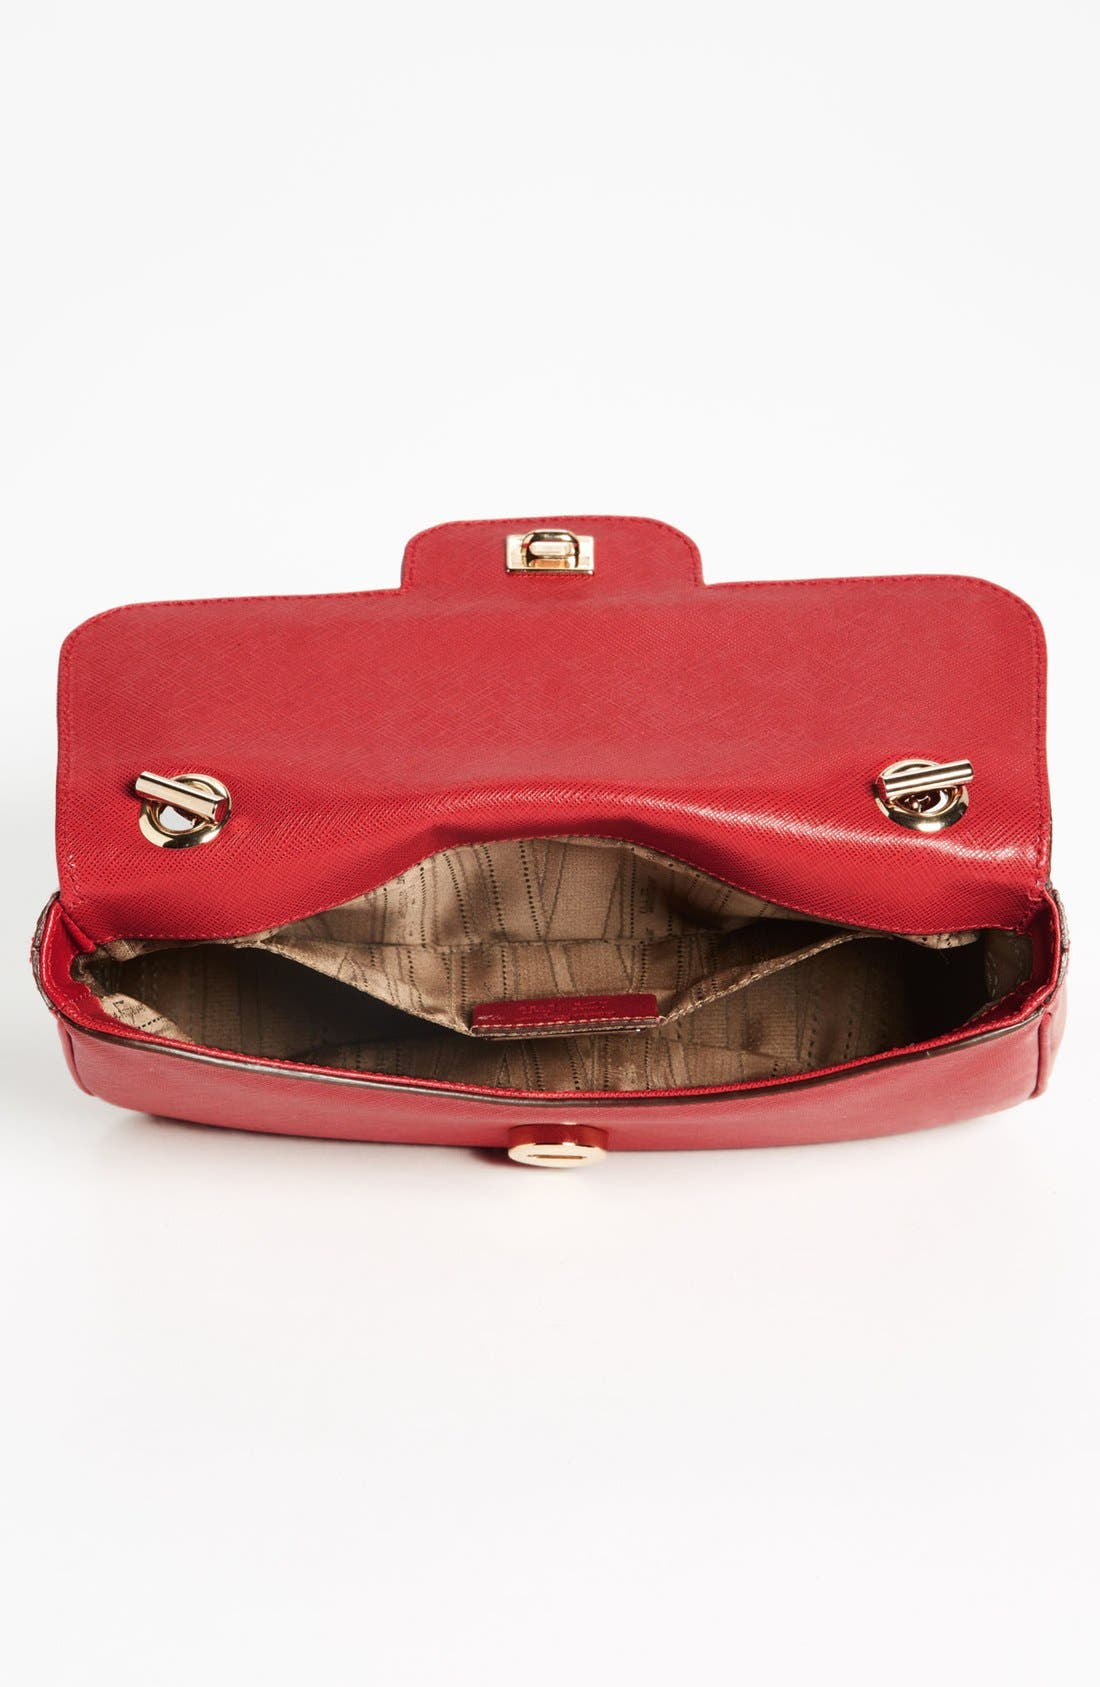 Alternate Image 3  - Salvatore Ferragamo 'Luciana' Leather Shoulder Bag